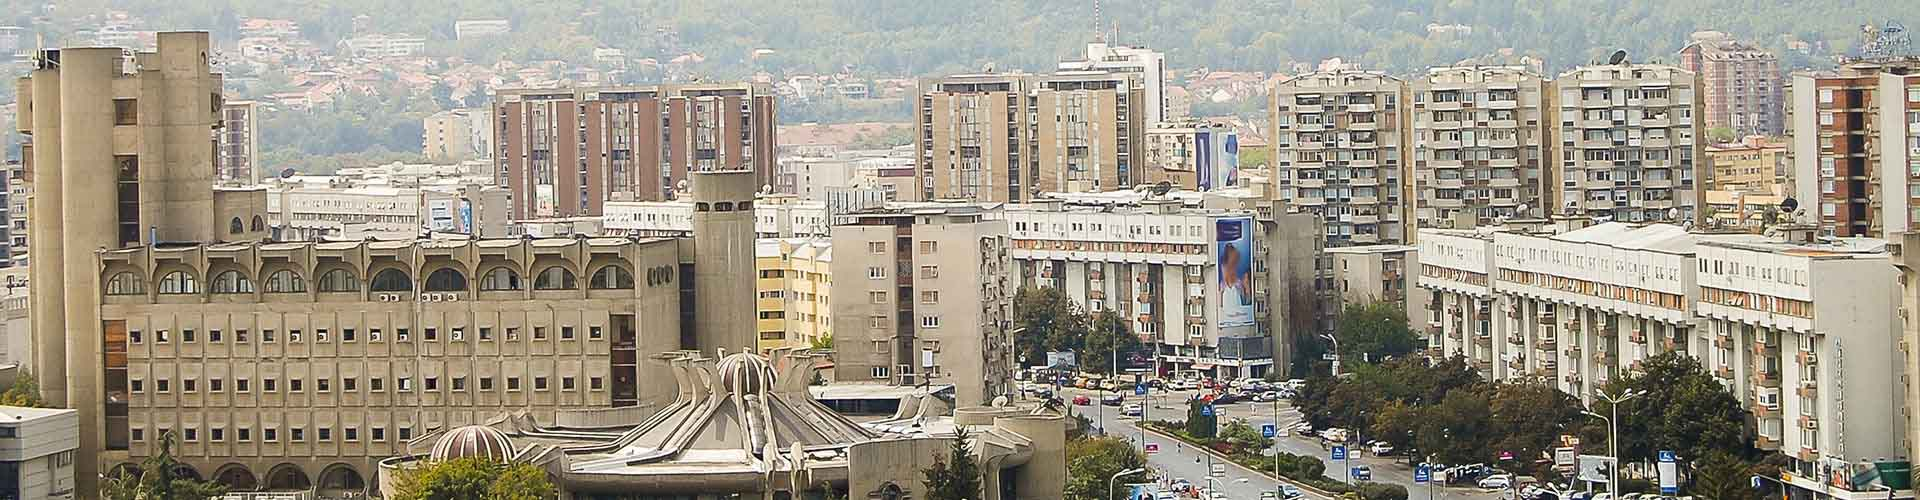 Skopje – Studentenunterkünfte, Hostels und Büroräume in Skopje (Mazedonien). Karte von Skopje, Fotos und Rezensionen von Studentenunterkünften, Hostels und Büroräumen in Skopje.